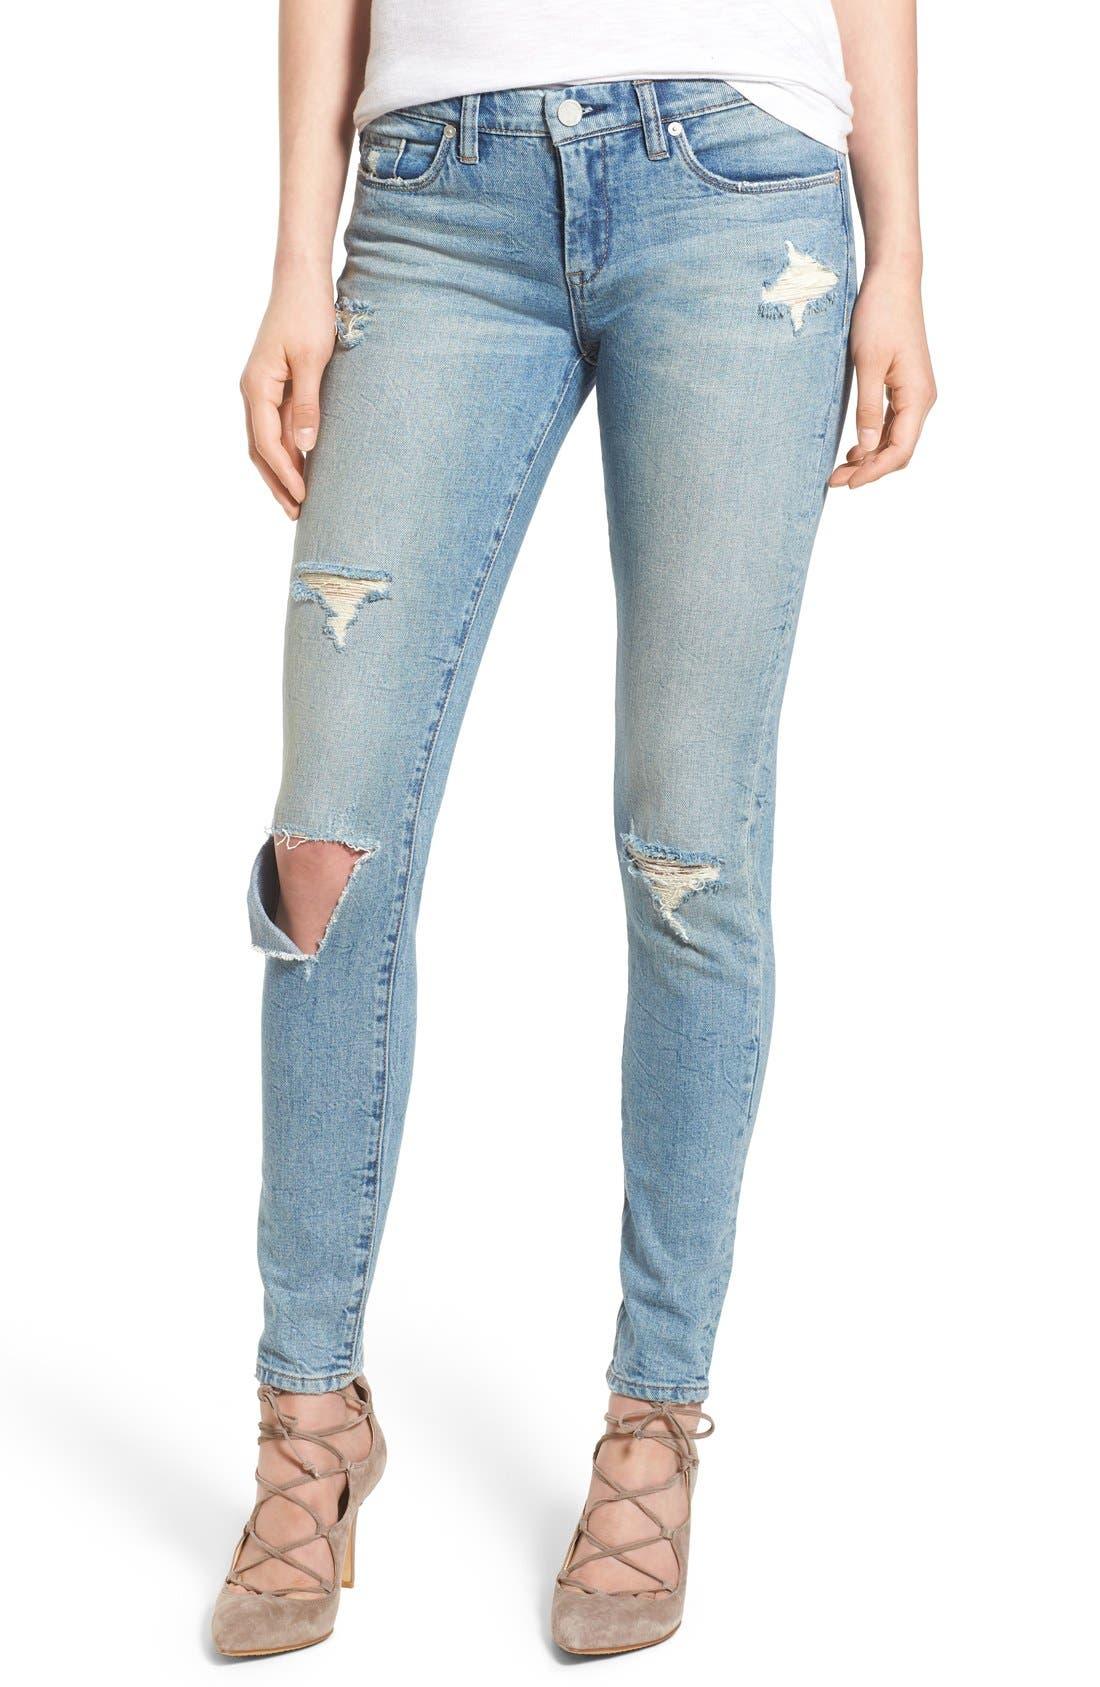 BLANKNYC, 'Skinny Dipper' Distressed Skinny Jeans, Main thumbnail 1, color, 400